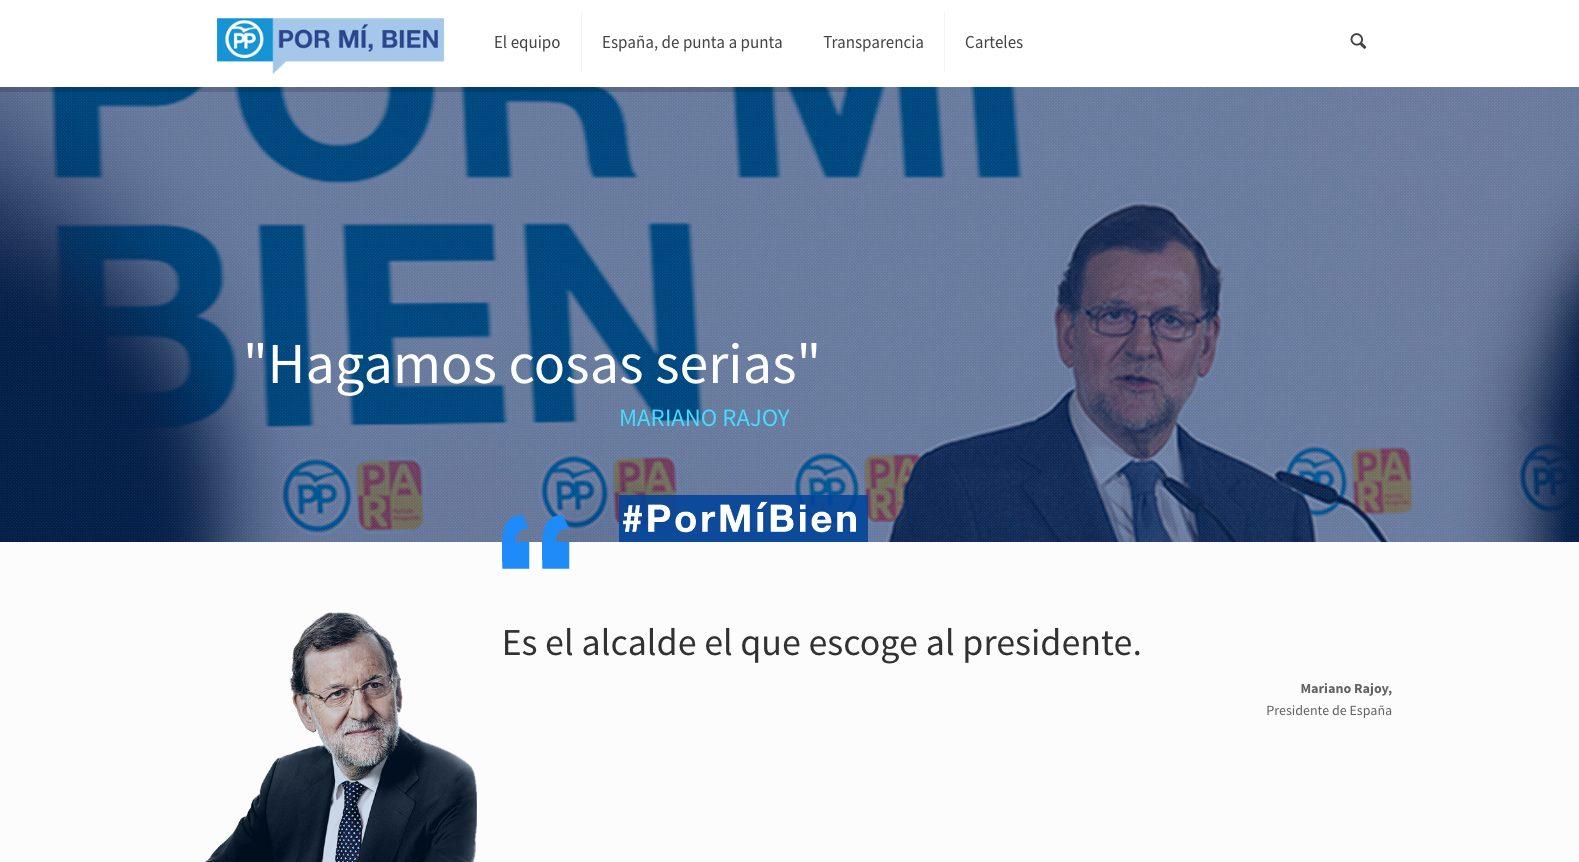 rajoypresidente.es - 6